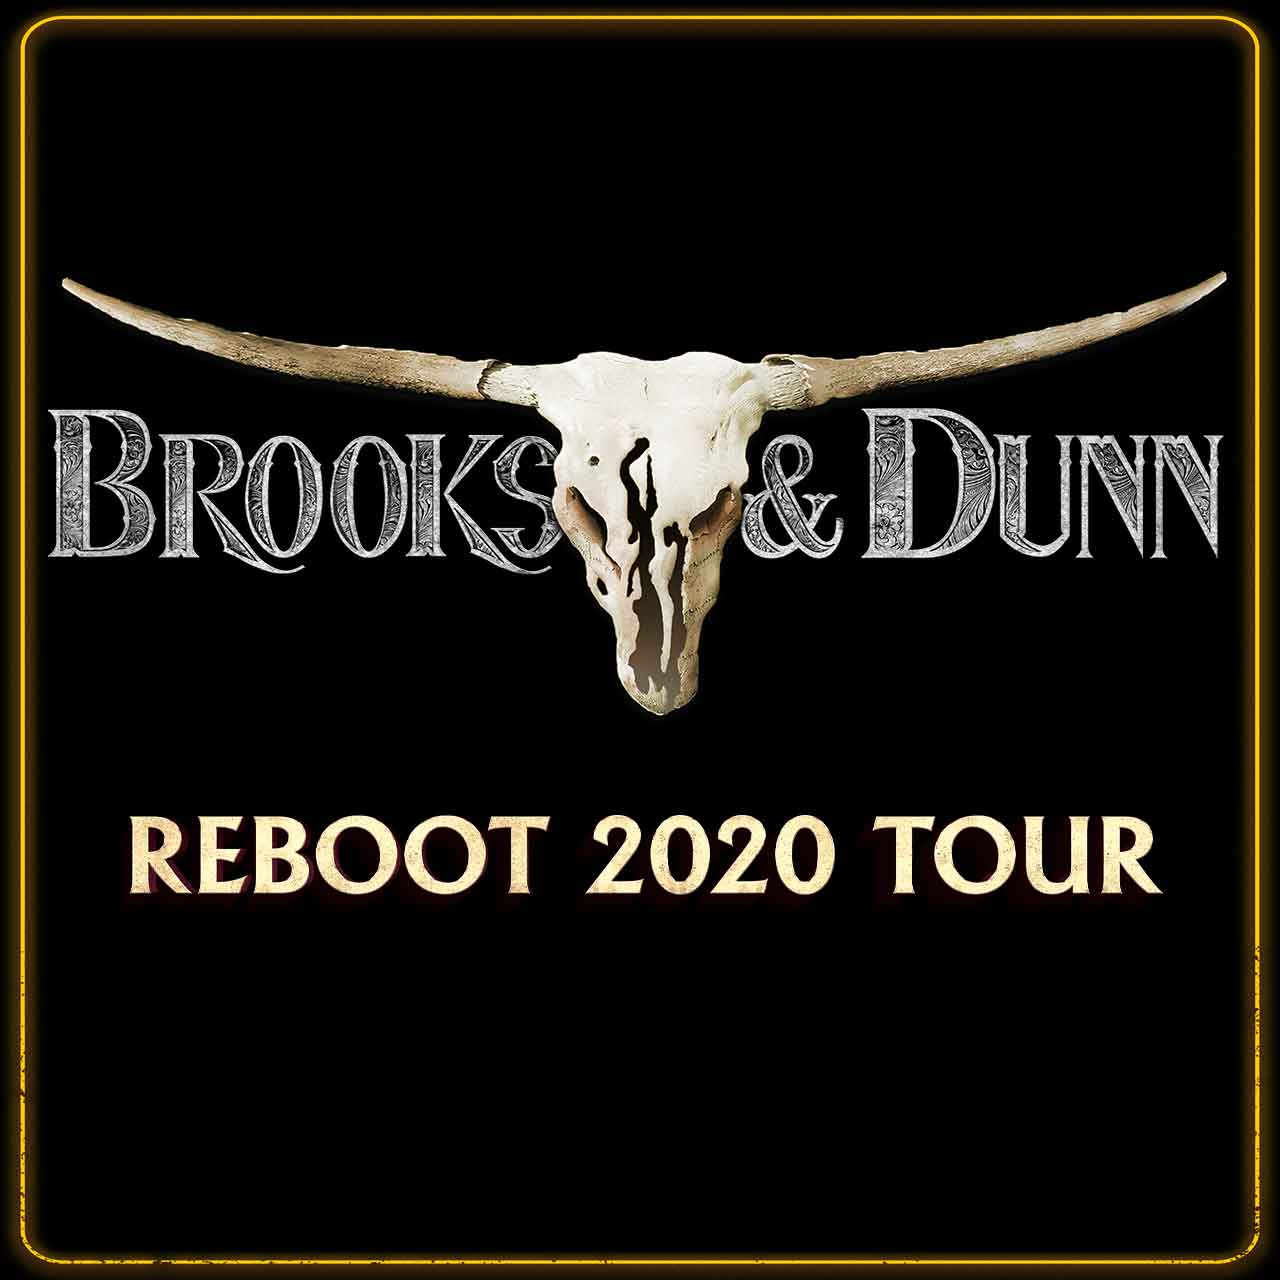 Reboot 2020 Tour